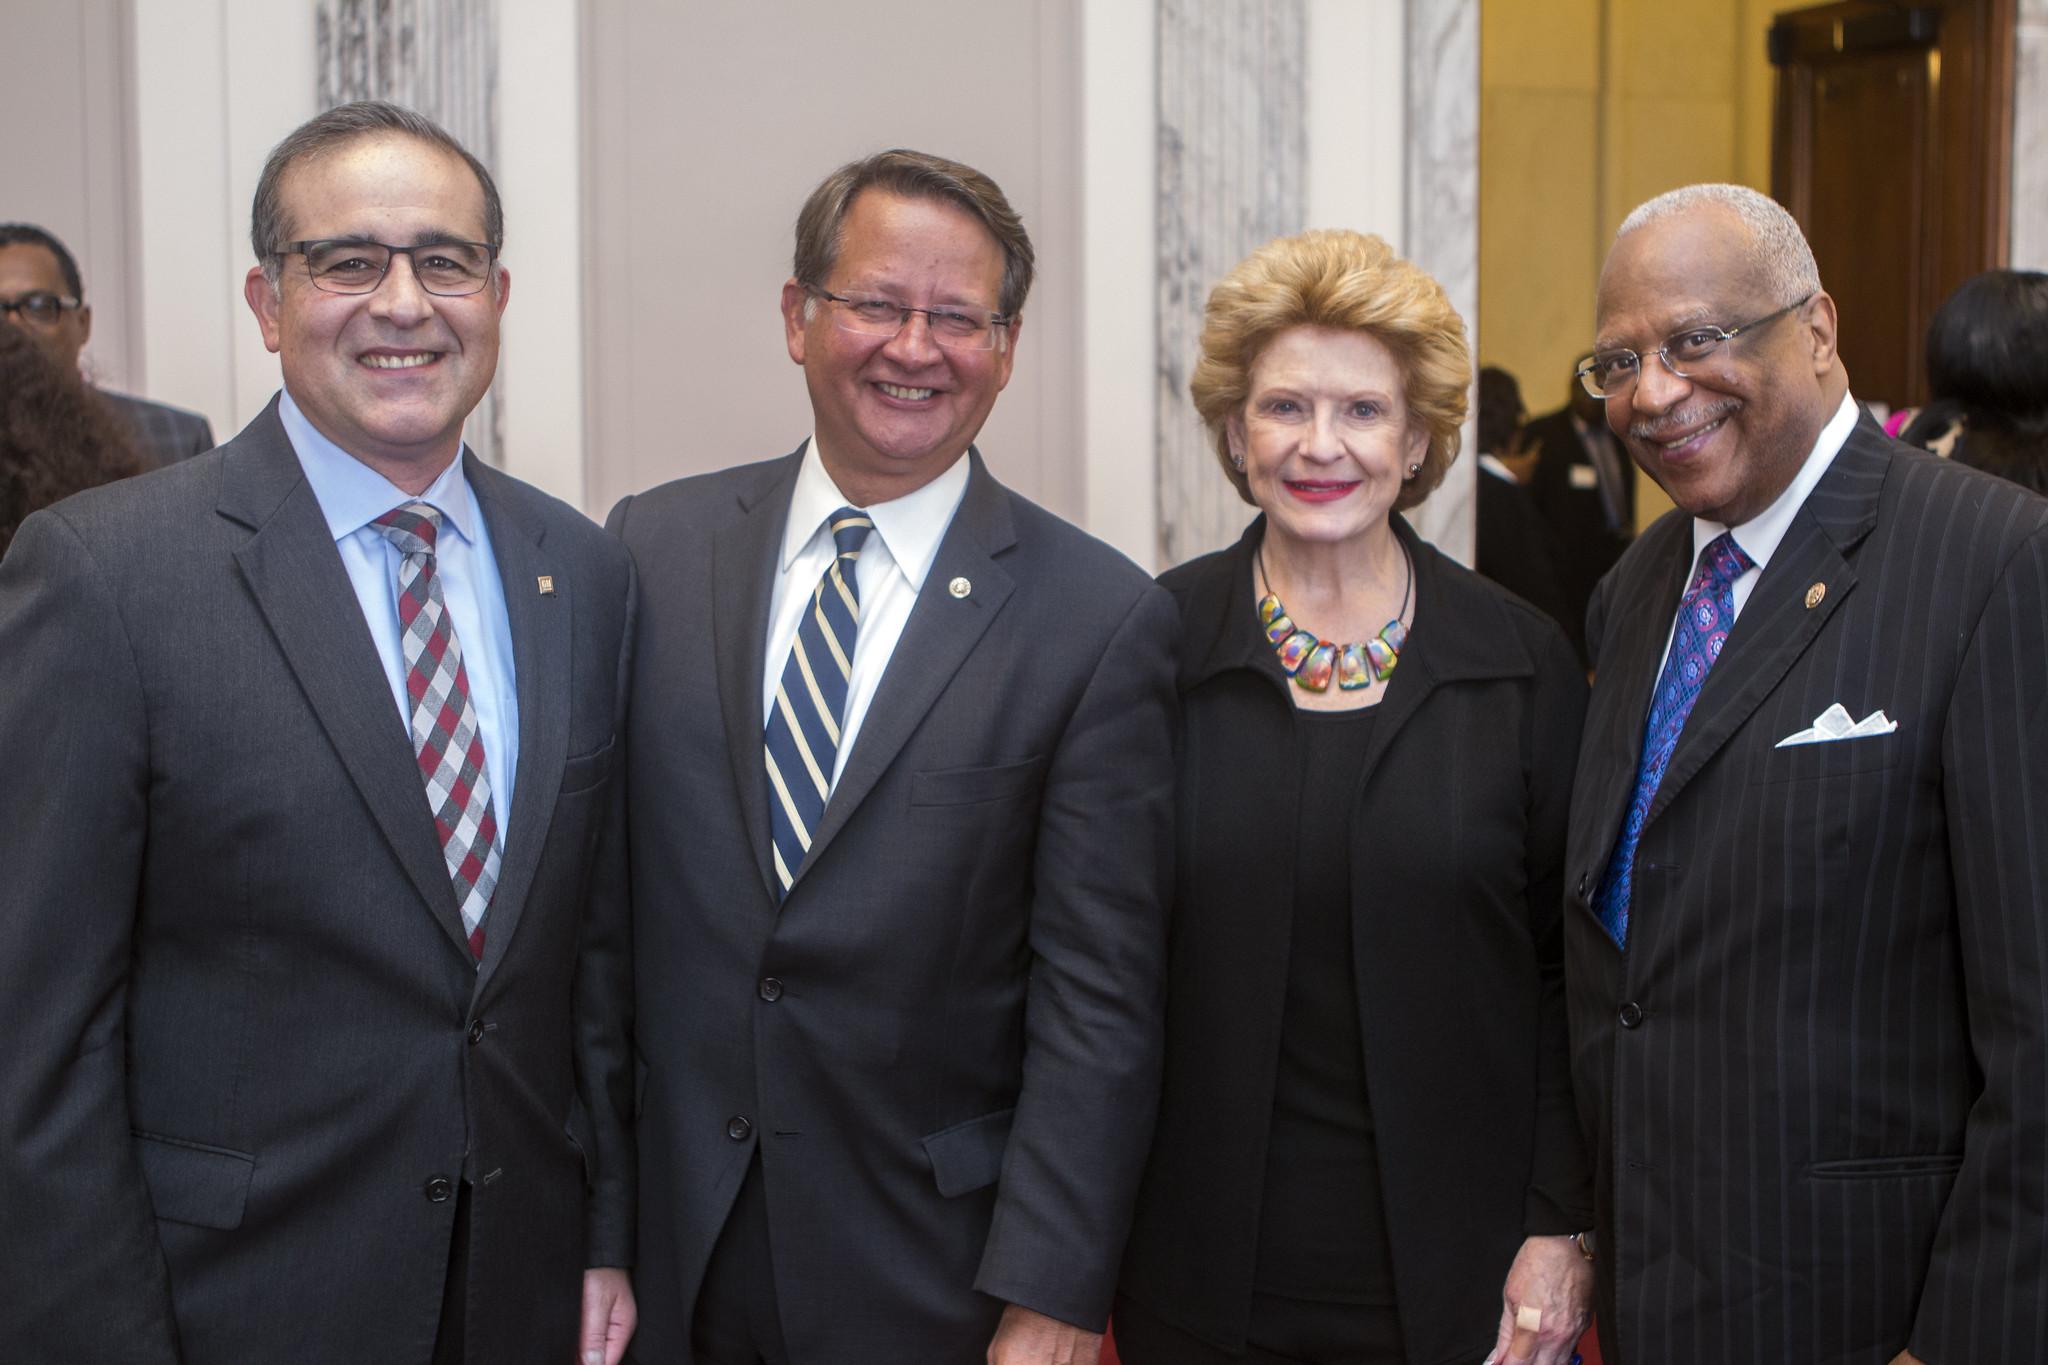 Photo by the office of U.S. Senator Debbie Stabenow via flickr.com cc 2.0